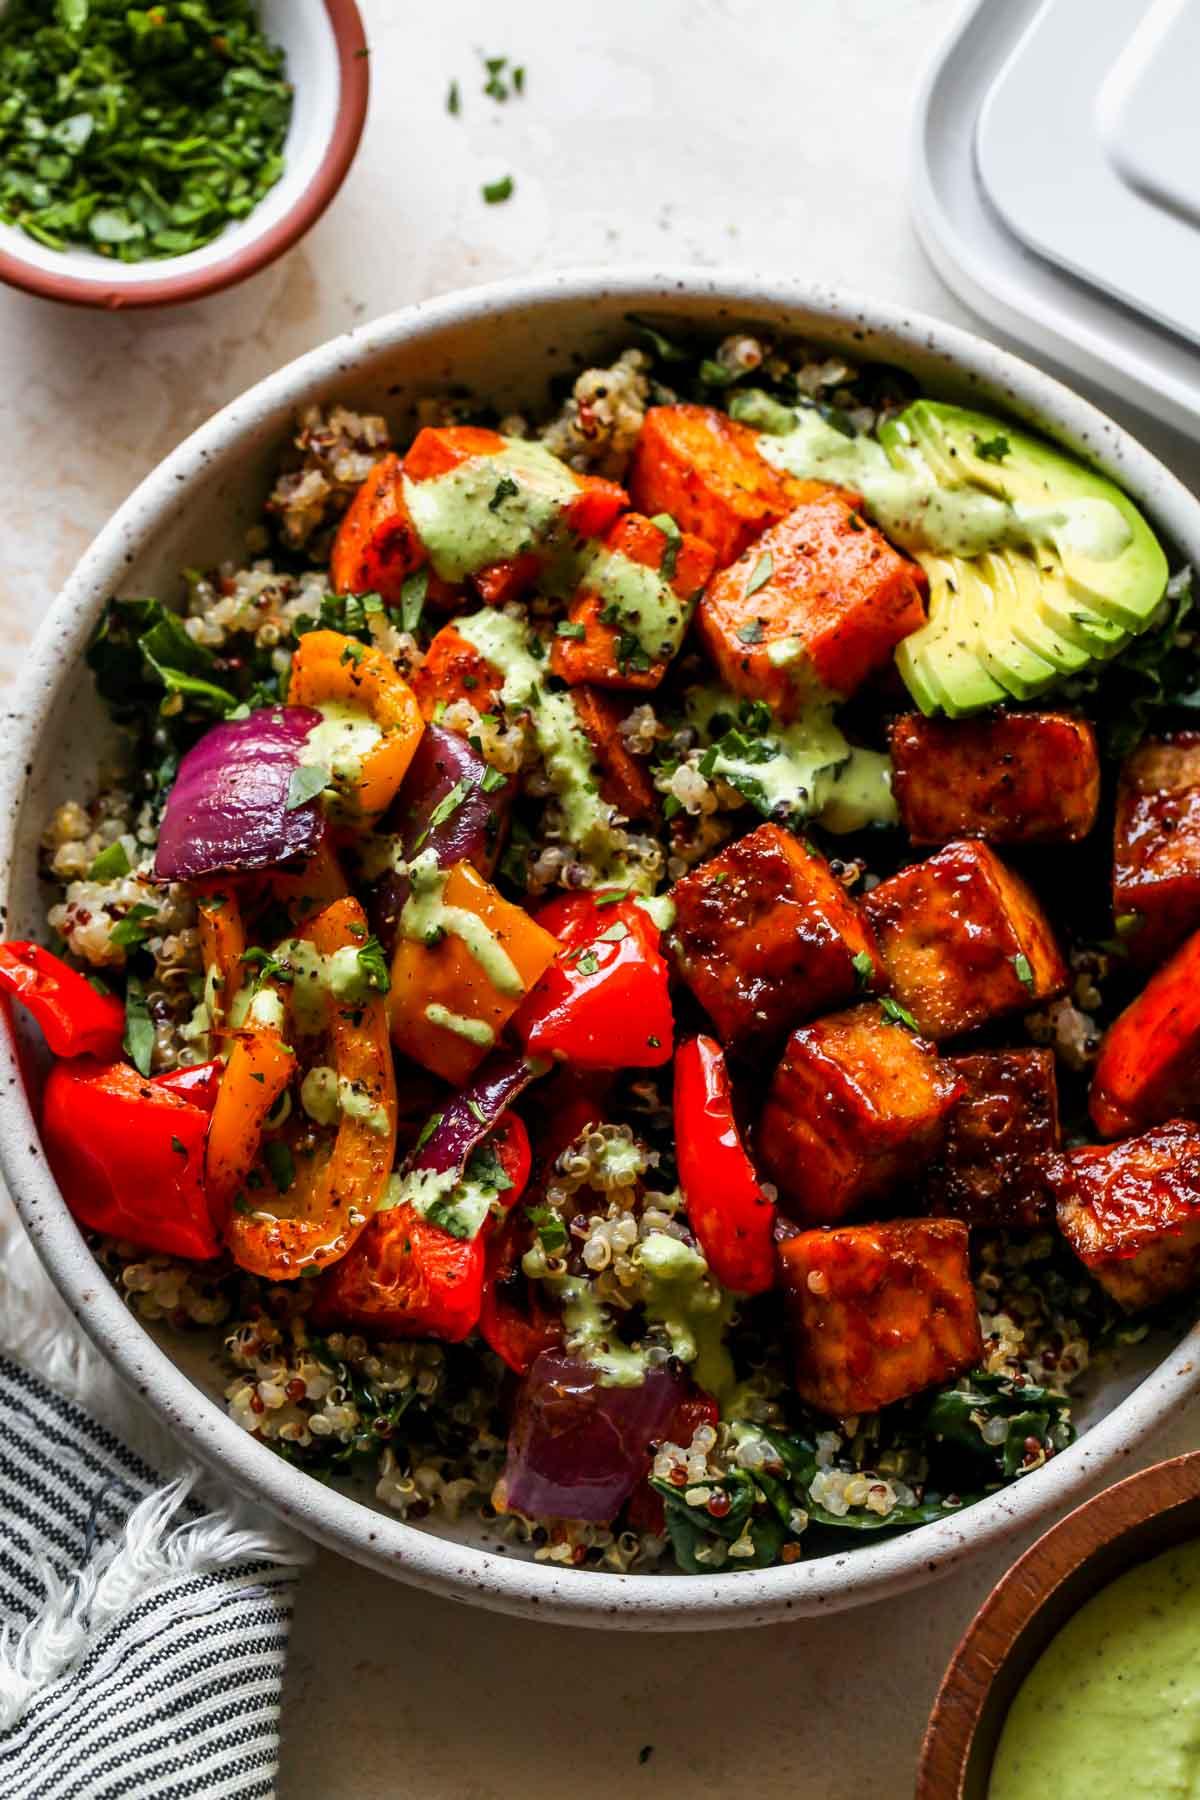 Sheet pan tofu bowls filled with quinoa, kale, roasted veggies, and green sauce